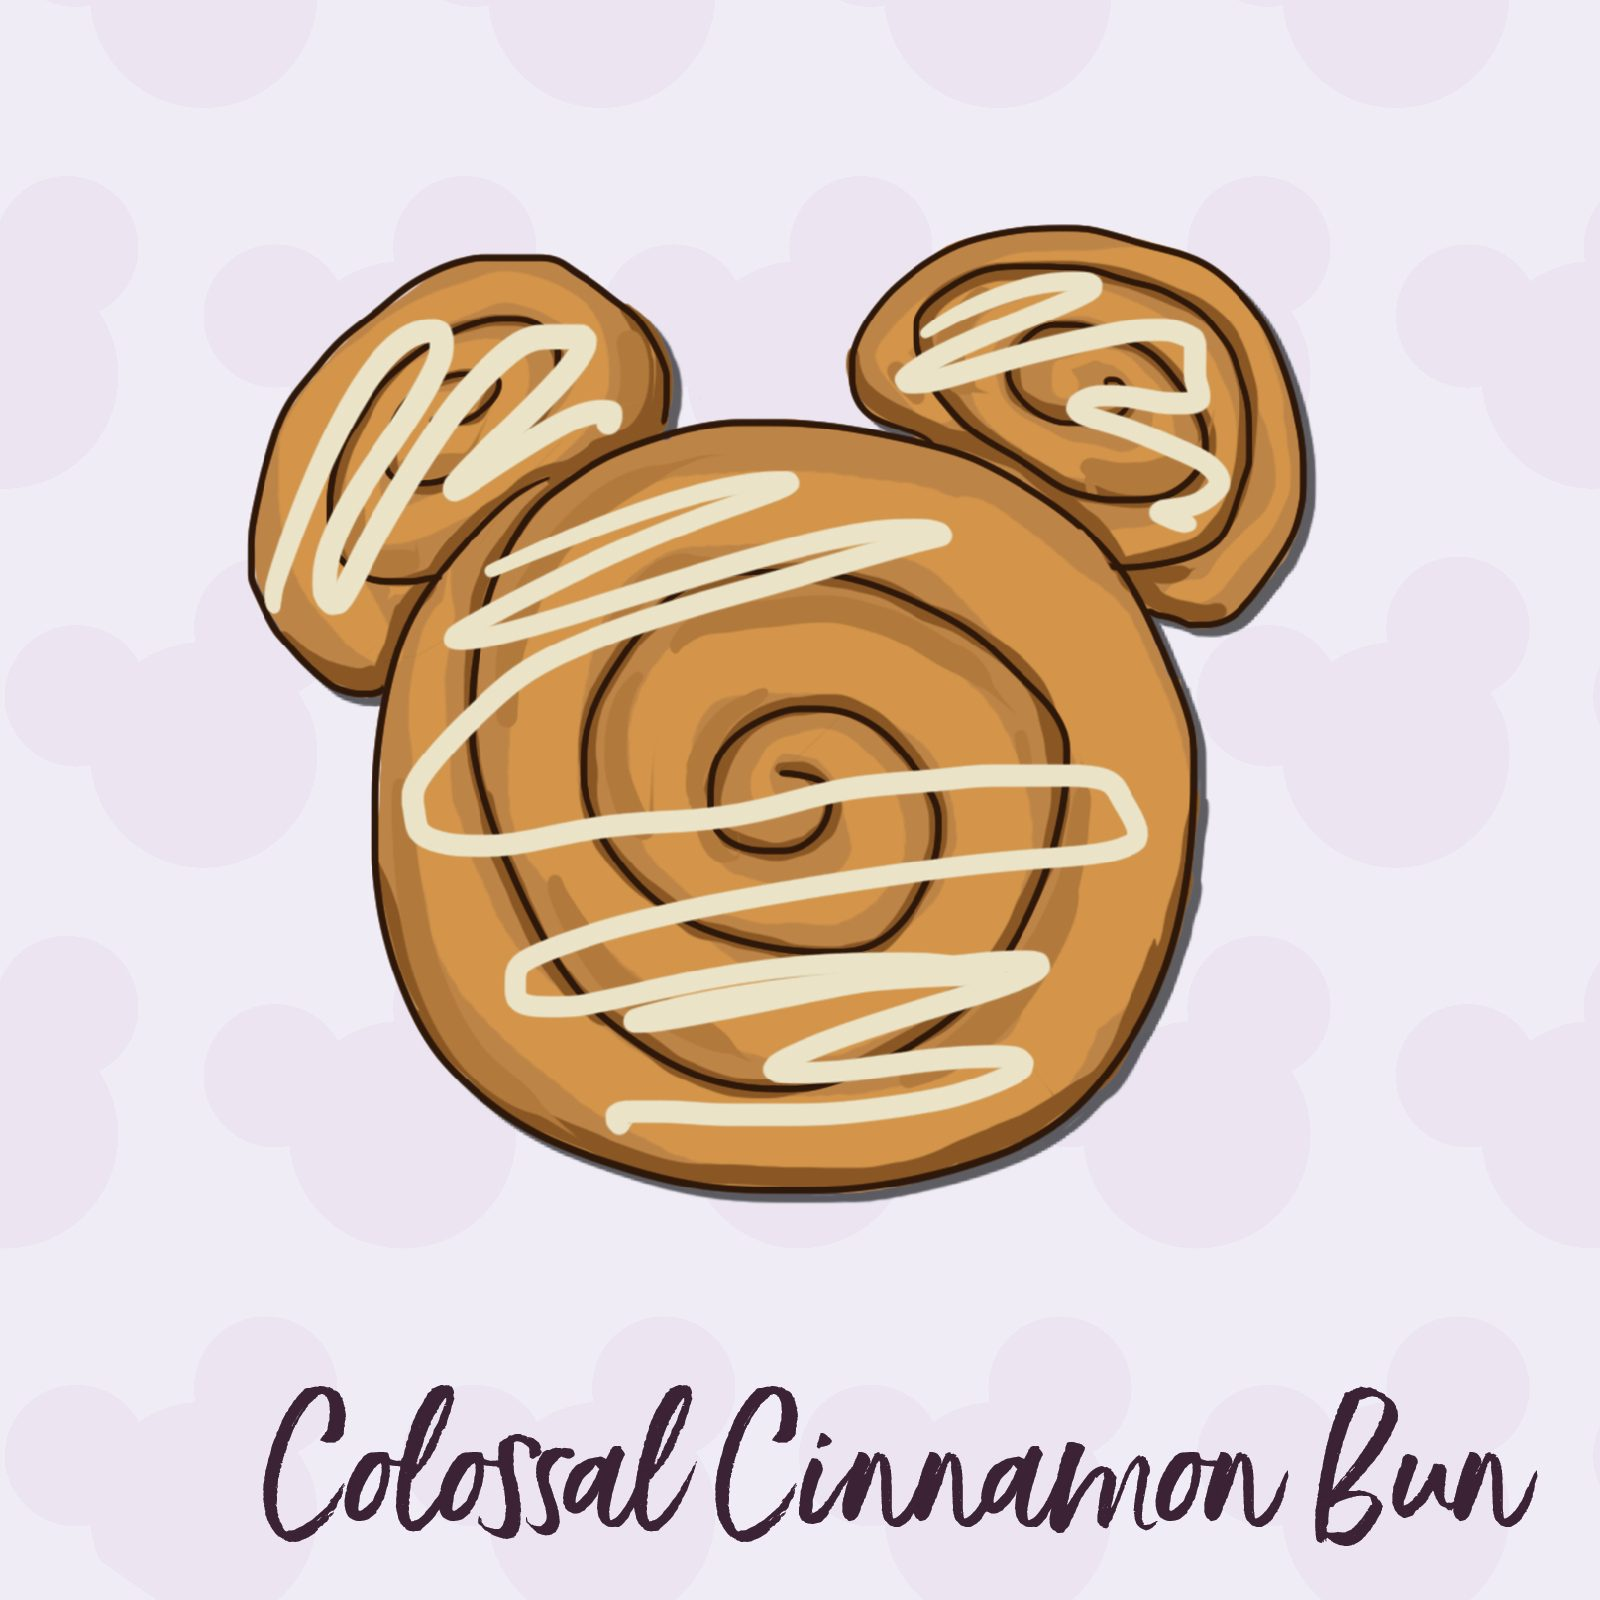 Colossal Cinnamon Bun disney